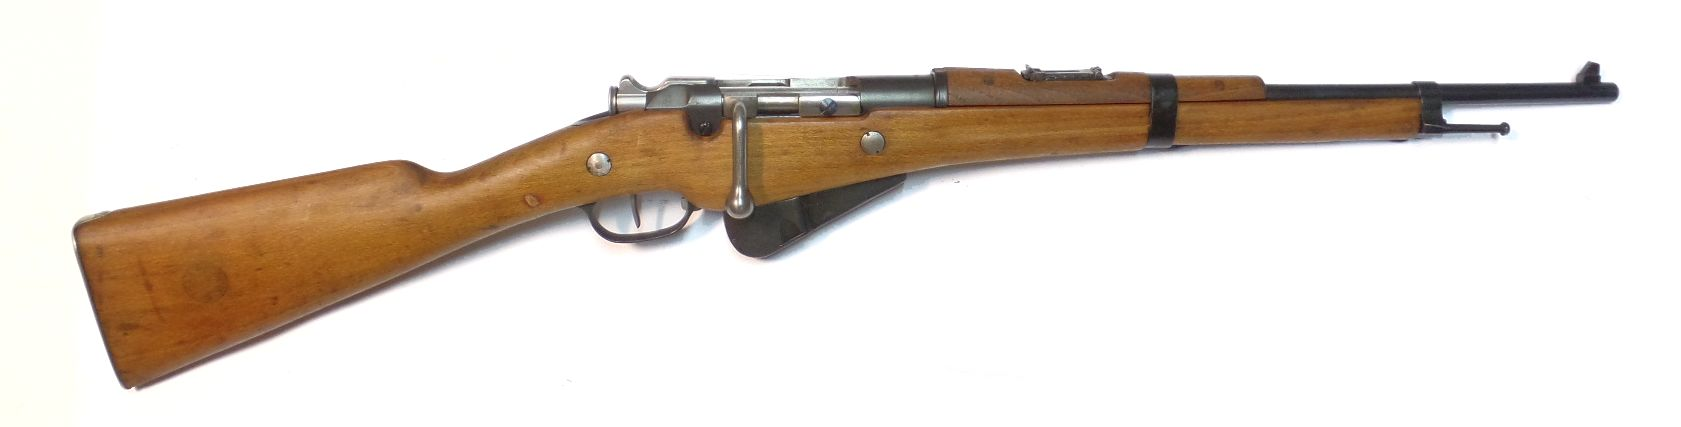 Mousqueton Modèle 16 calibre 8mmLEBEL